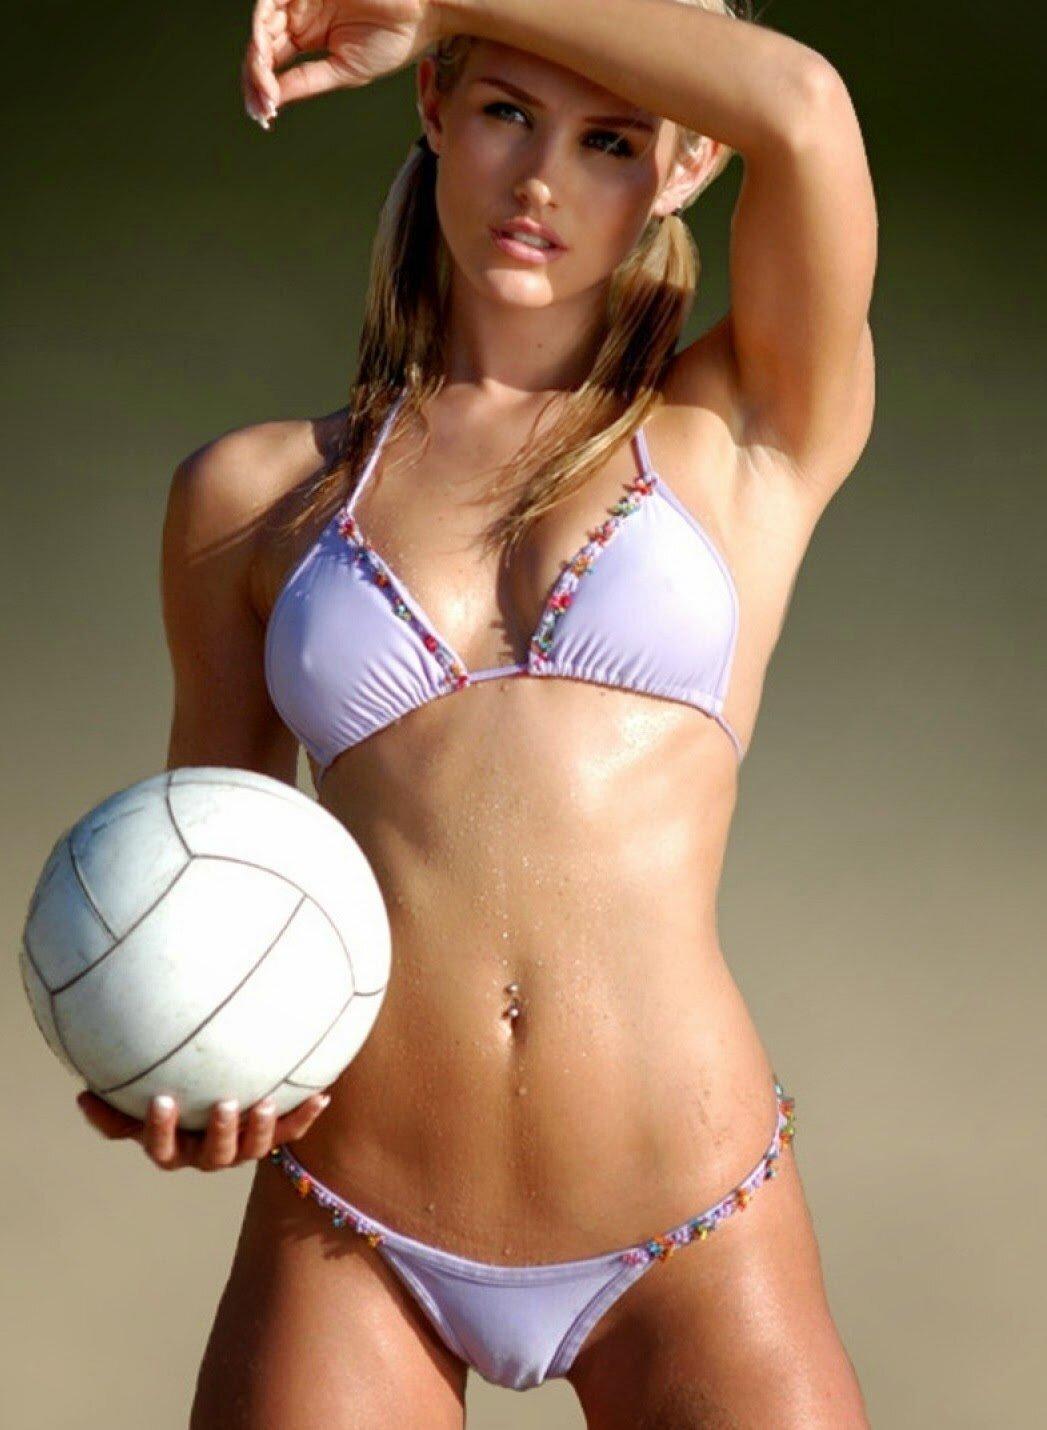 nude-beautiful-girl-camel-toe